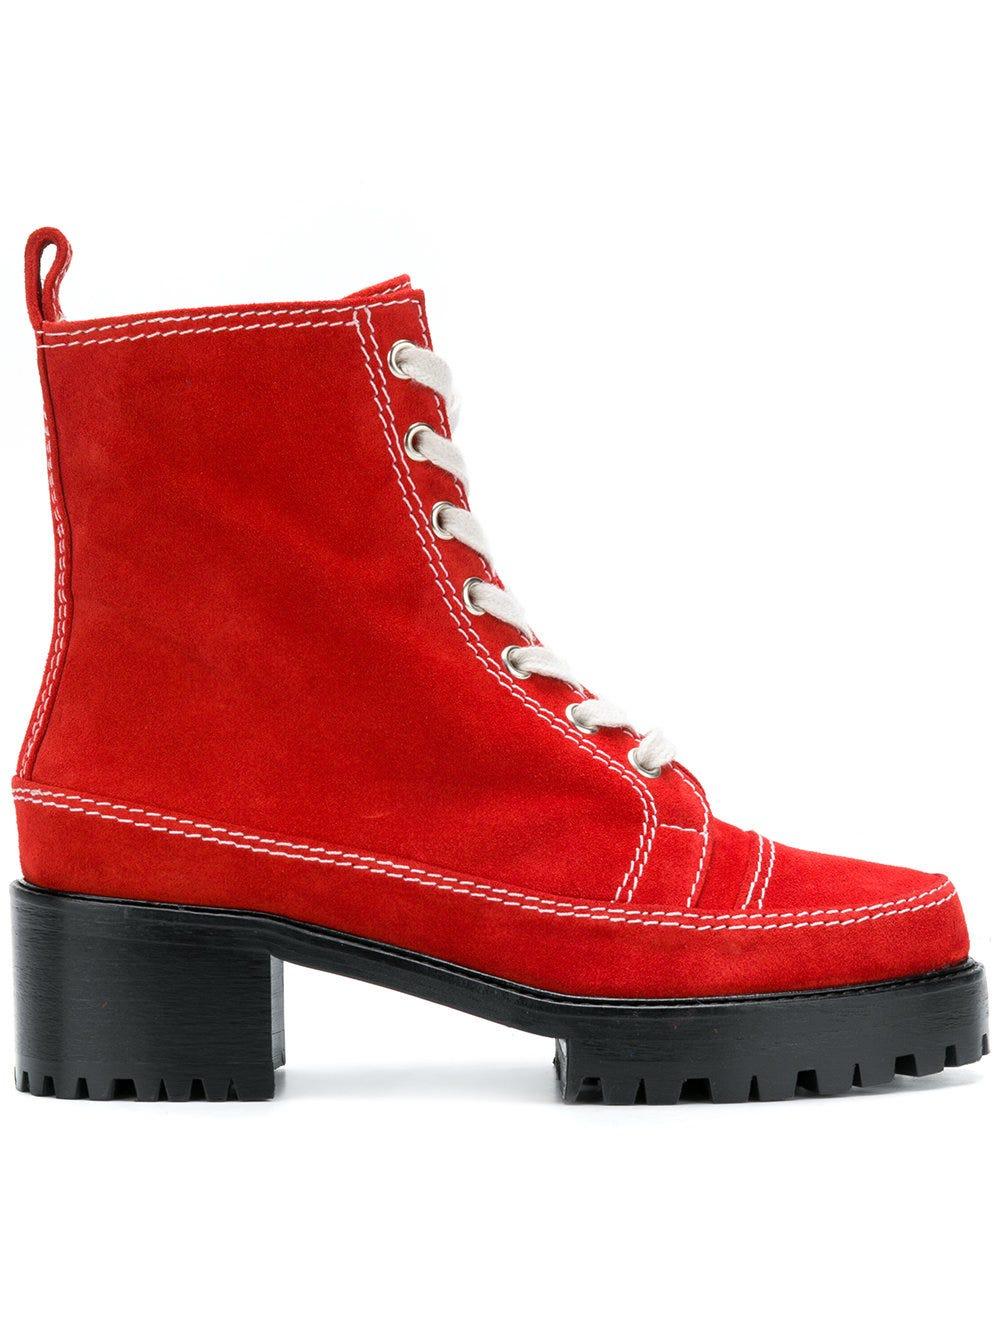 Nicole Saldan? Chris 2.0 boots